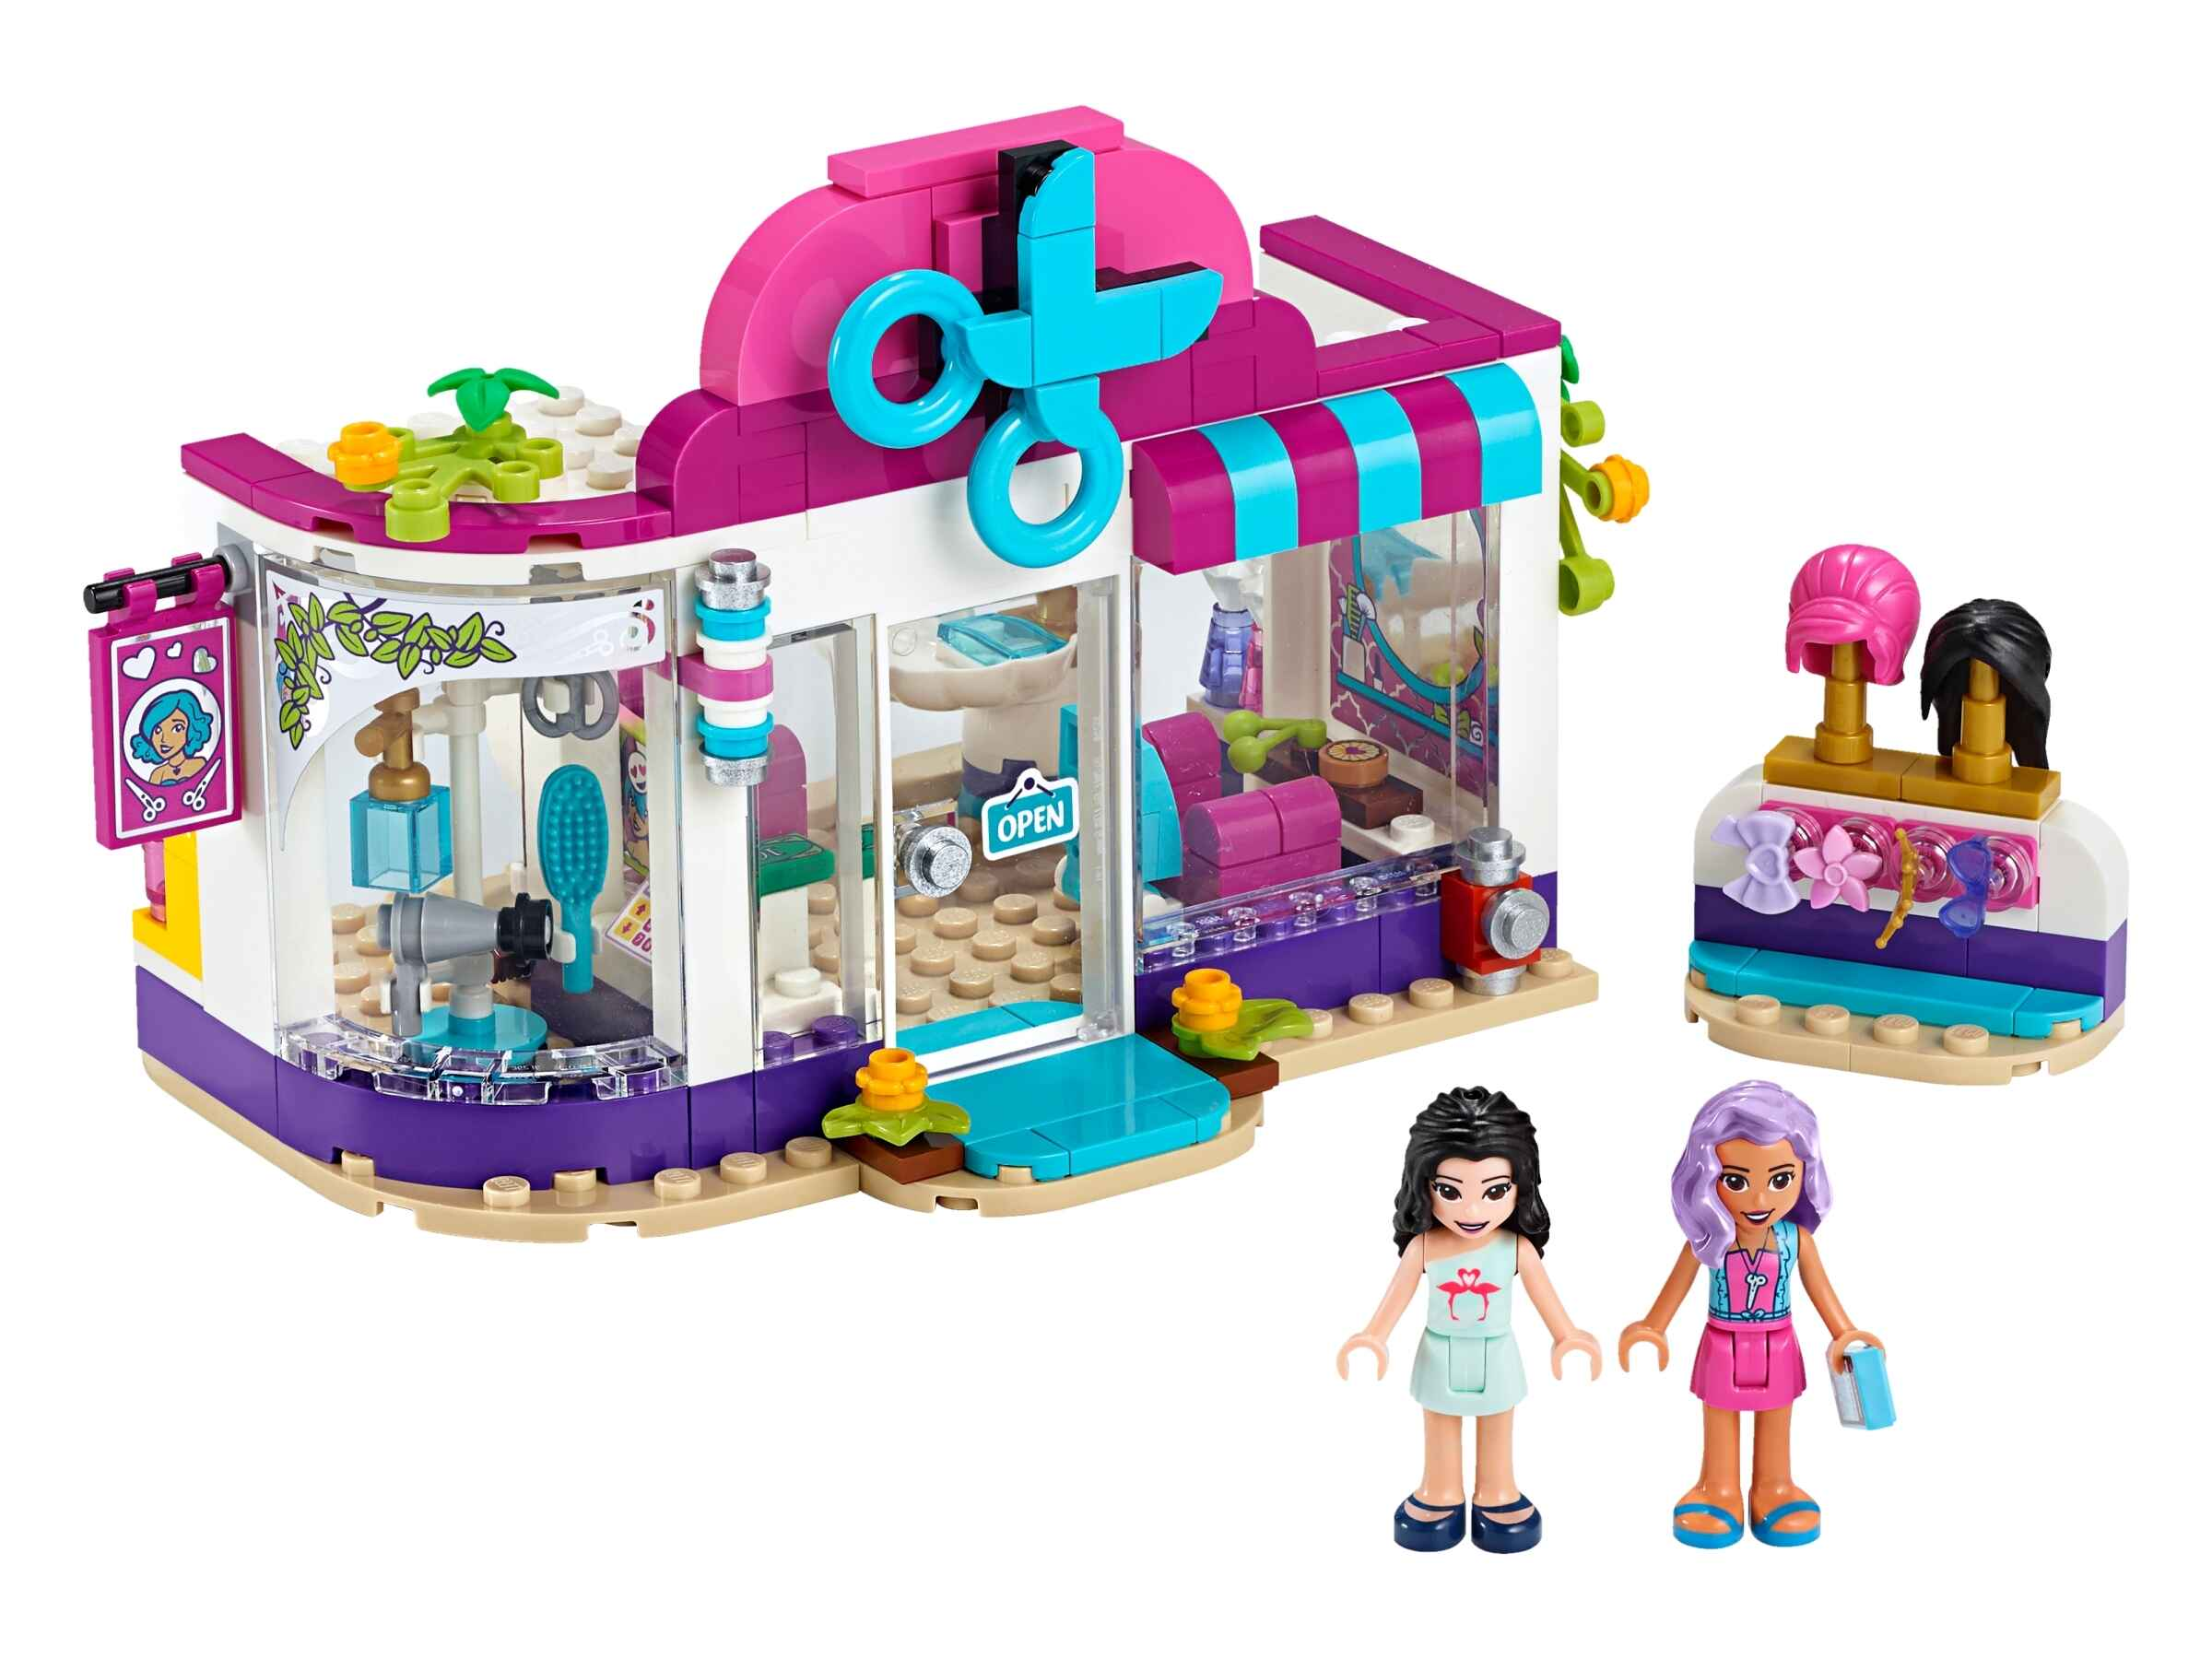 LEGO 41391 Friends Friseursalon von Heartlake City Set mit Mini Puppe Emma